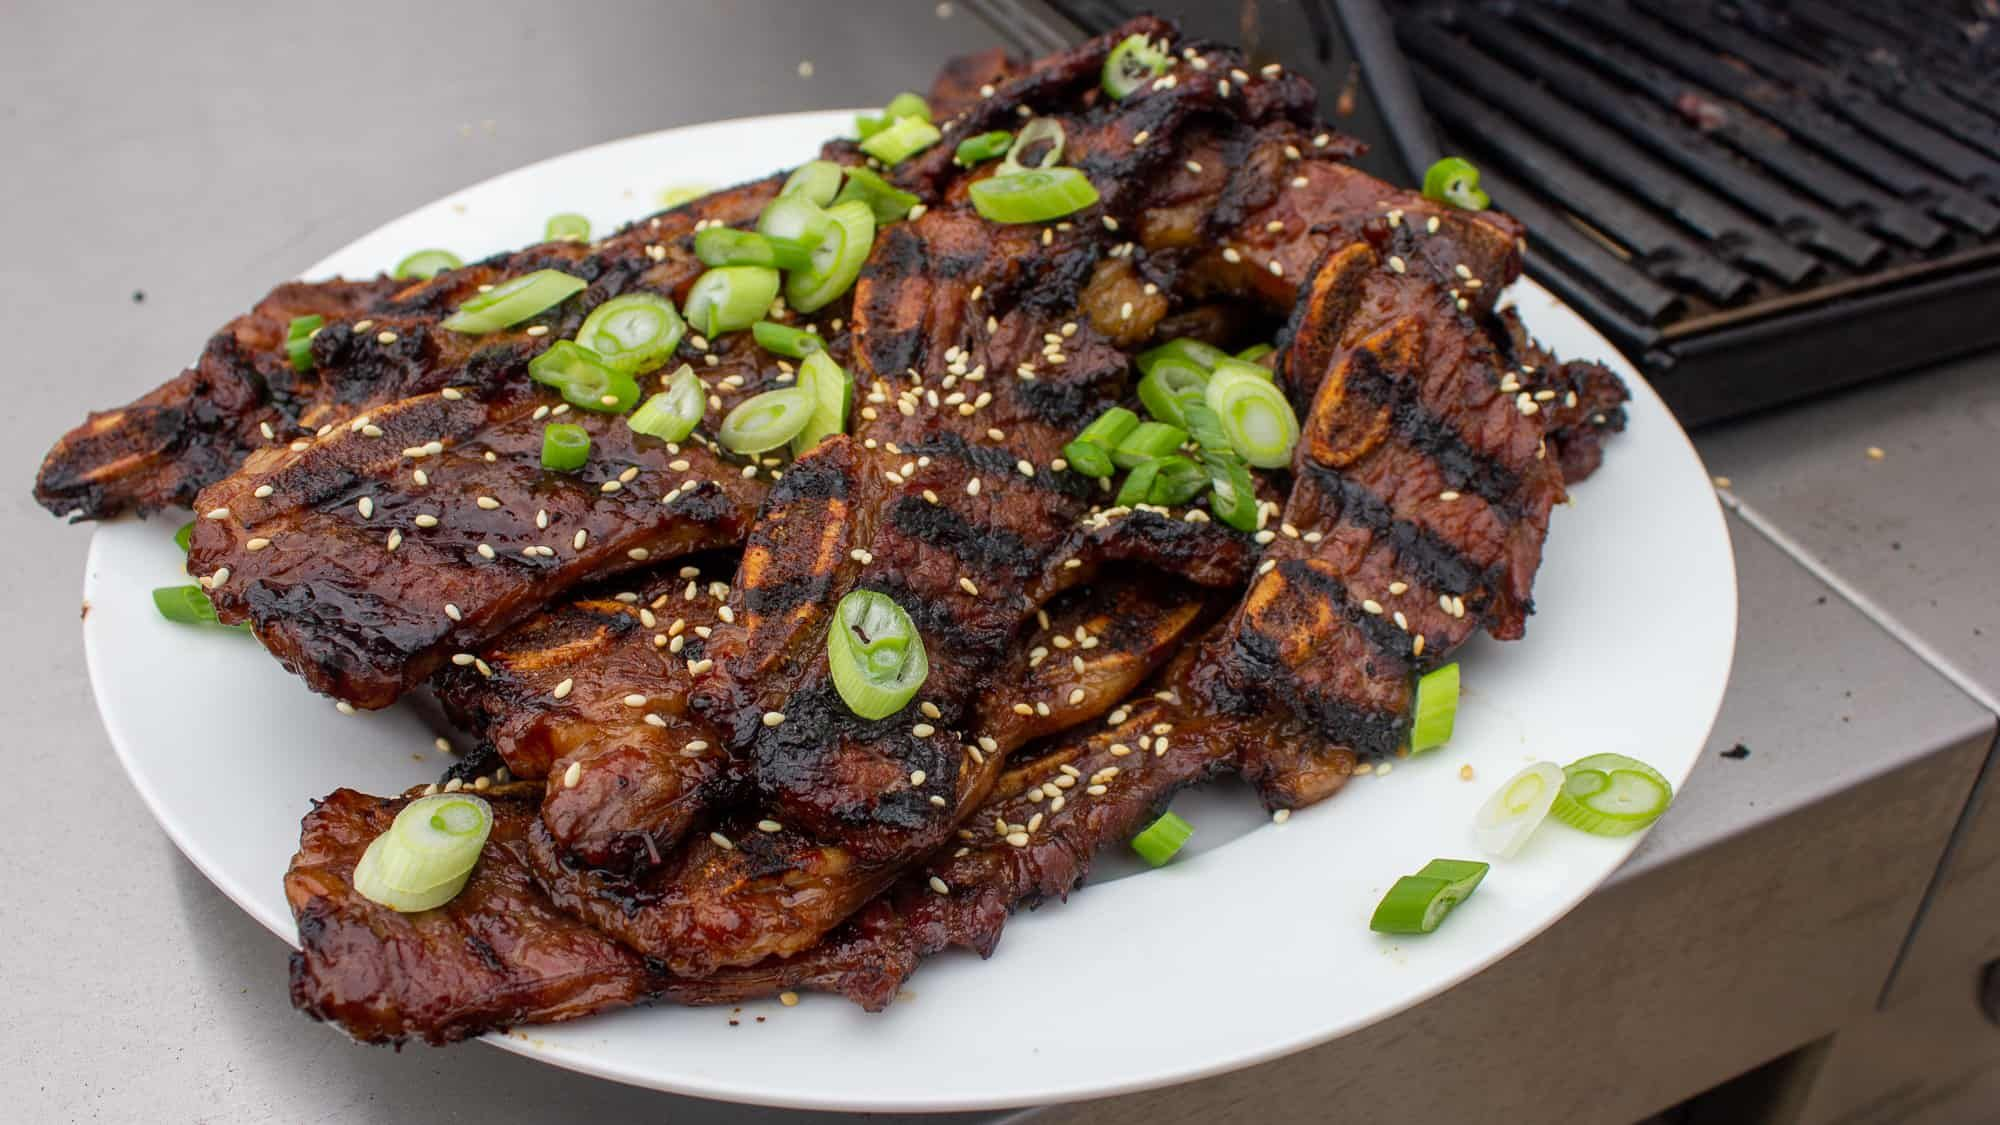 Kalbi Korean Bbq Short Ribs Recipe The Black Peppercorn Kalbi Thin Sliced Short Ribs In A Korean Marinade Once Pork Ribs Rib Recipes Sous Vide Recipes